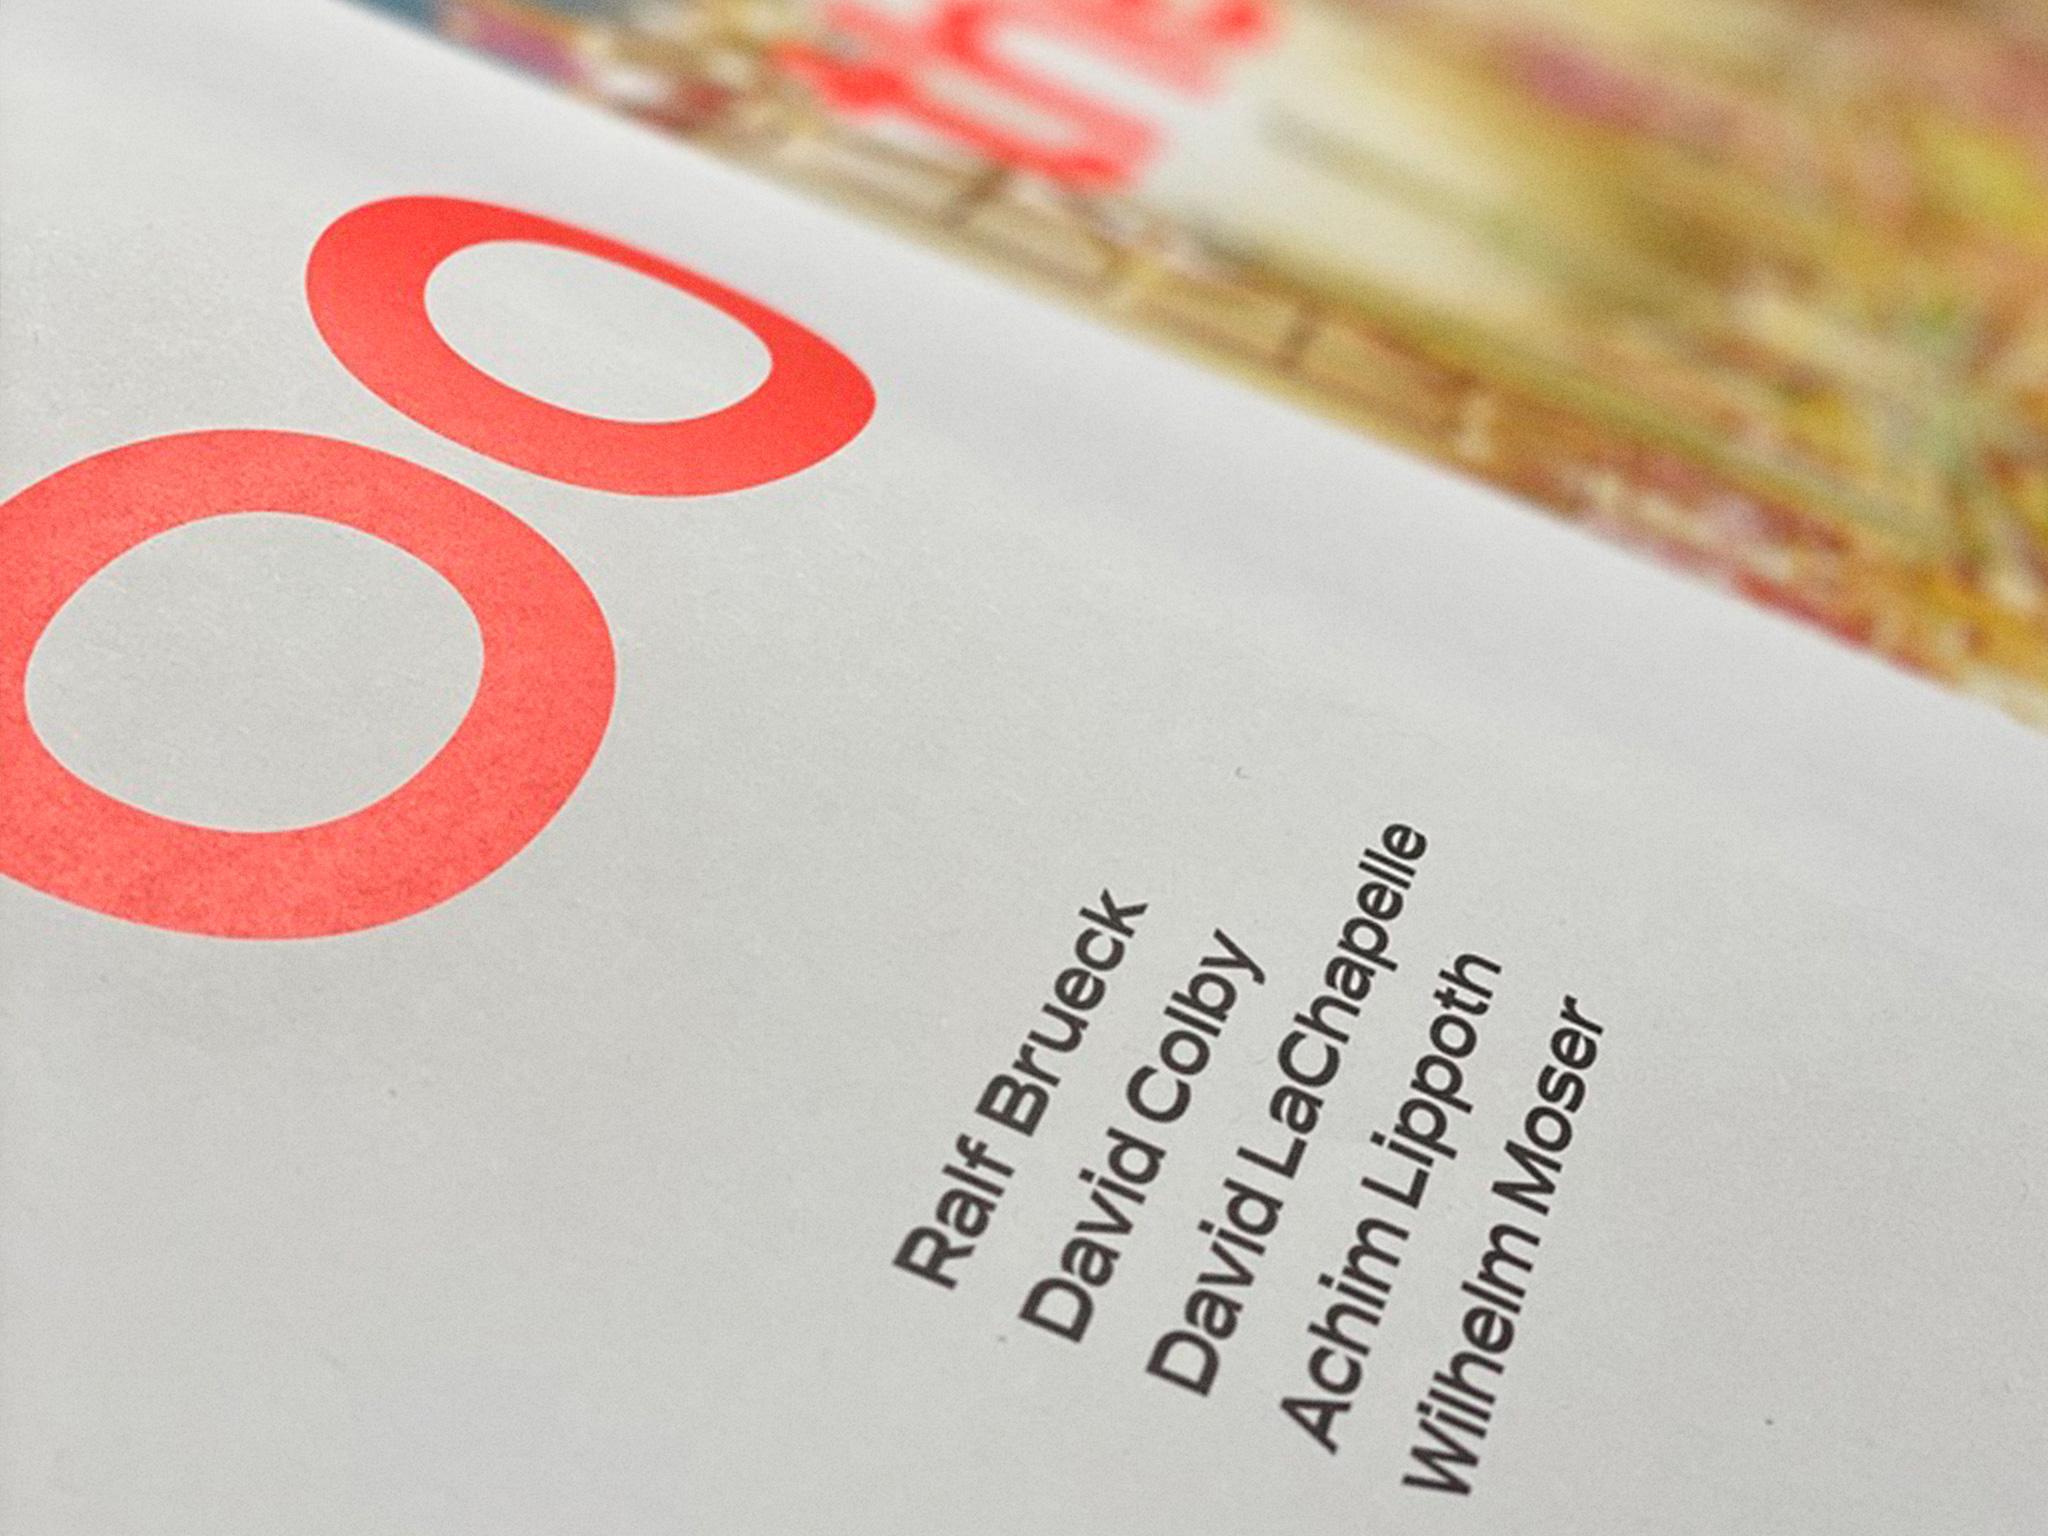 the amateur magazine • launch • issue 00 • pretty on point •düsseldorf